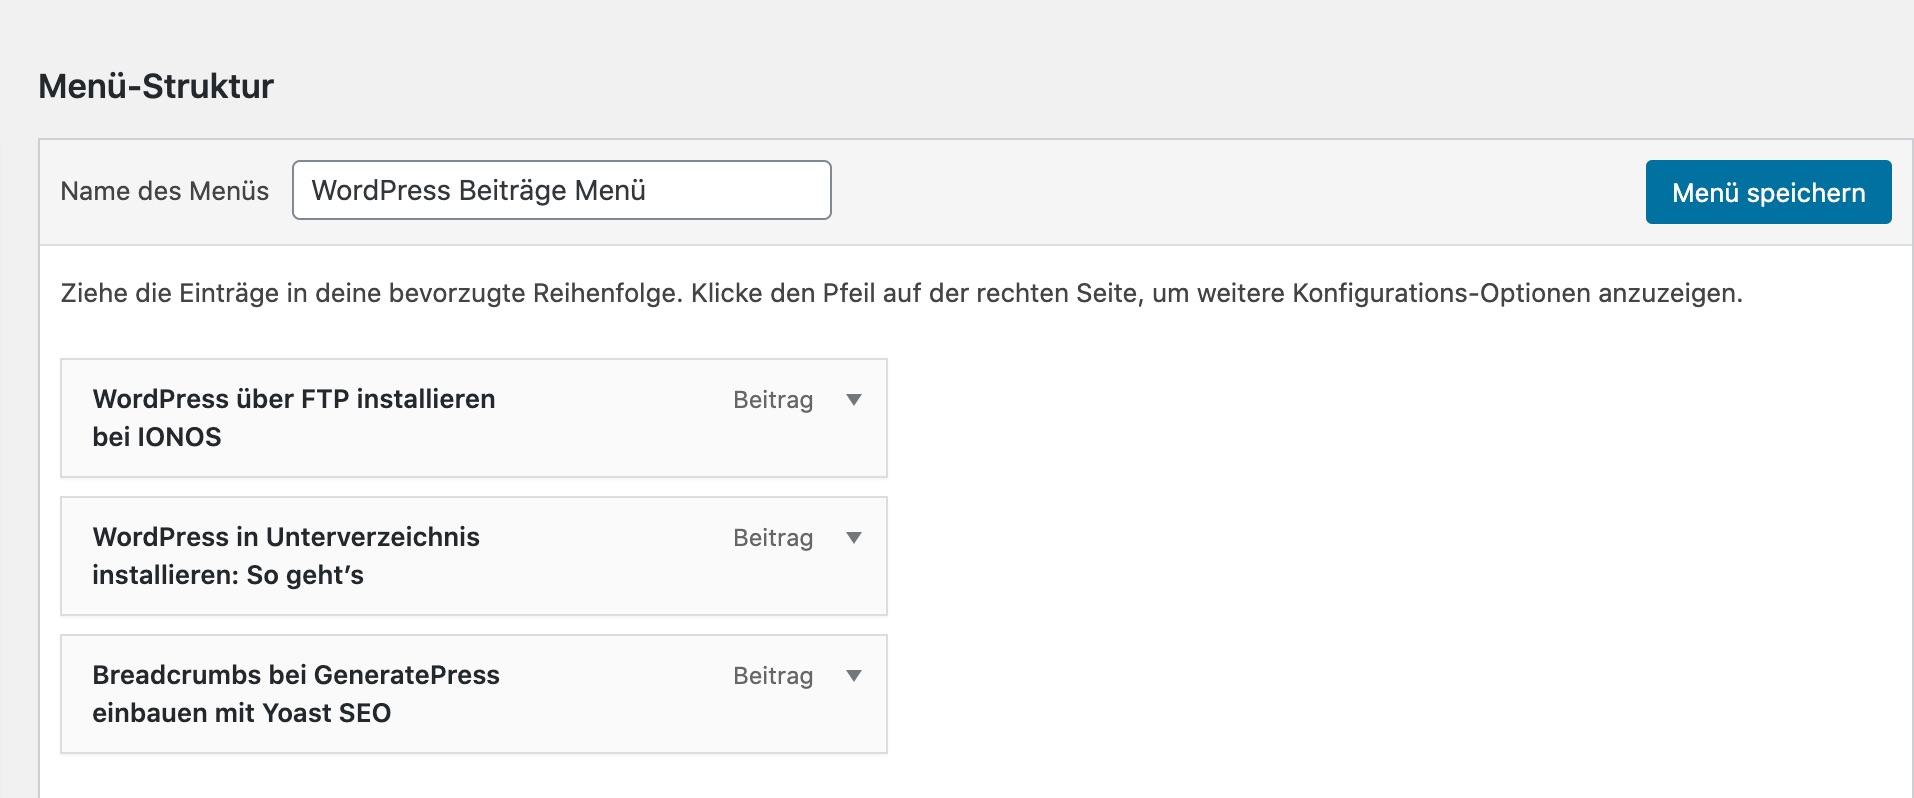 wordpress-menu-in beitrag